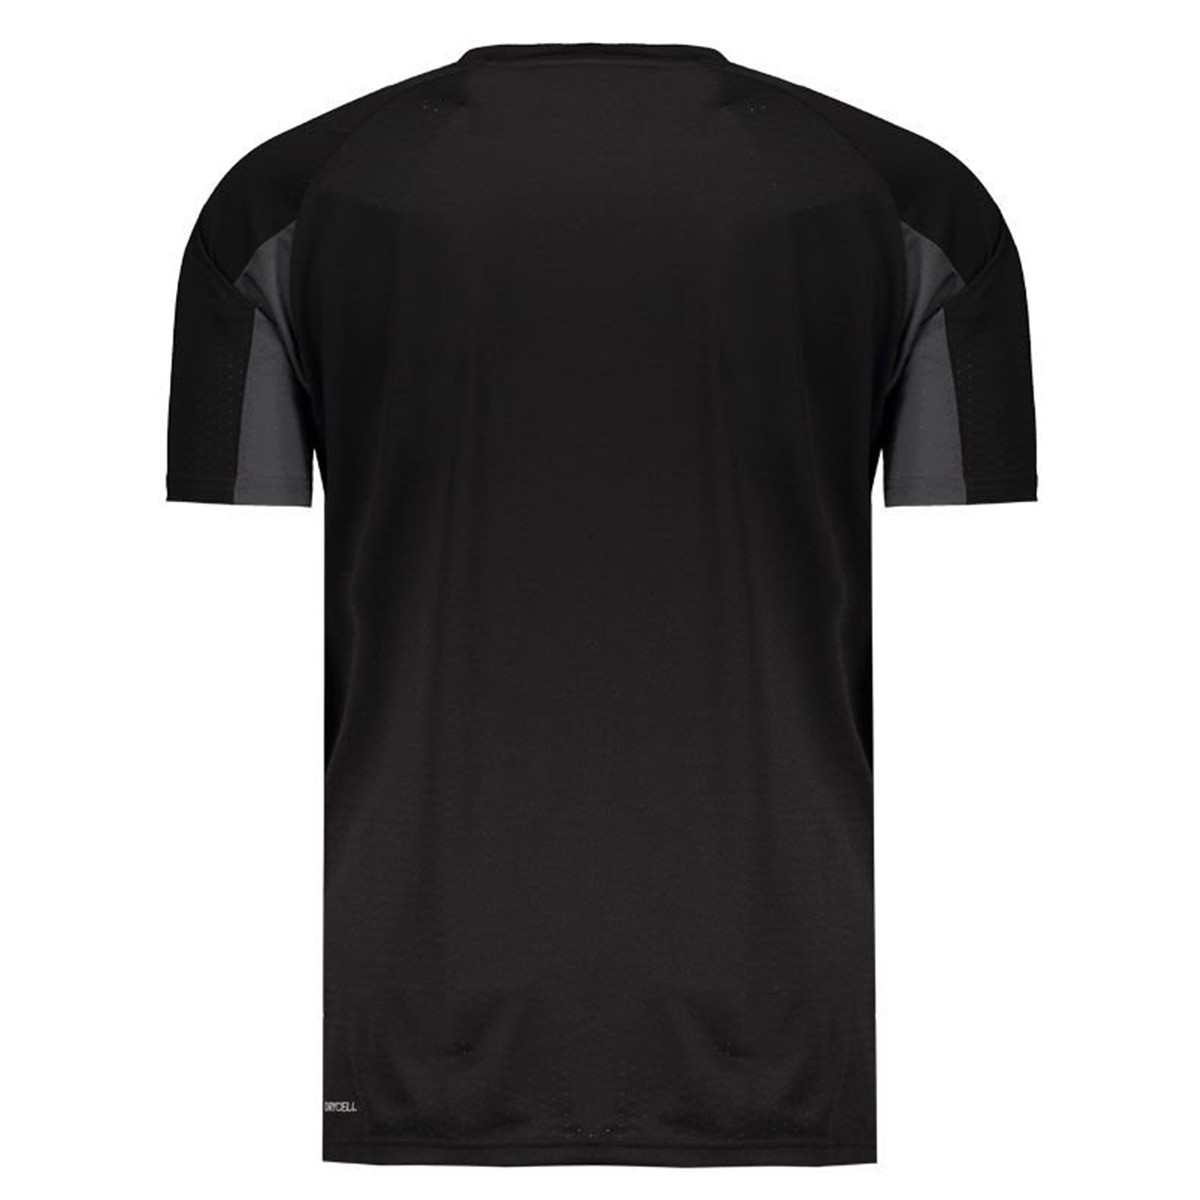 Camiseta Puma A.C.E SS Block Tee Asphalt - Cinza - Masculina